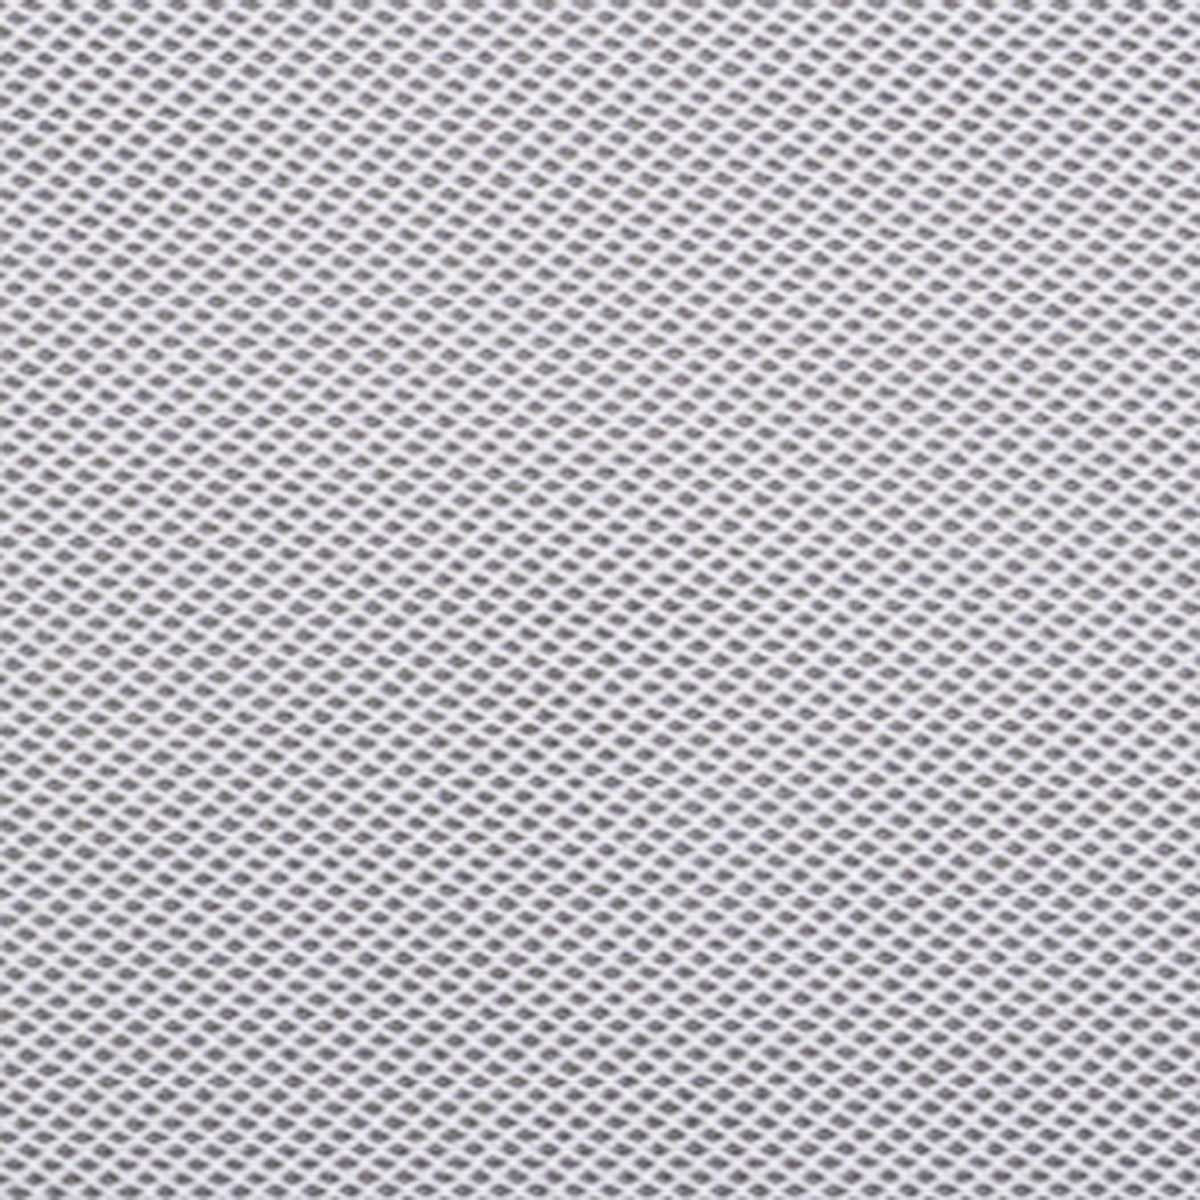 Stanchions For Sale >> Power Net 100 - Scrim, Netting & Mesh - All Fabric   Dazian